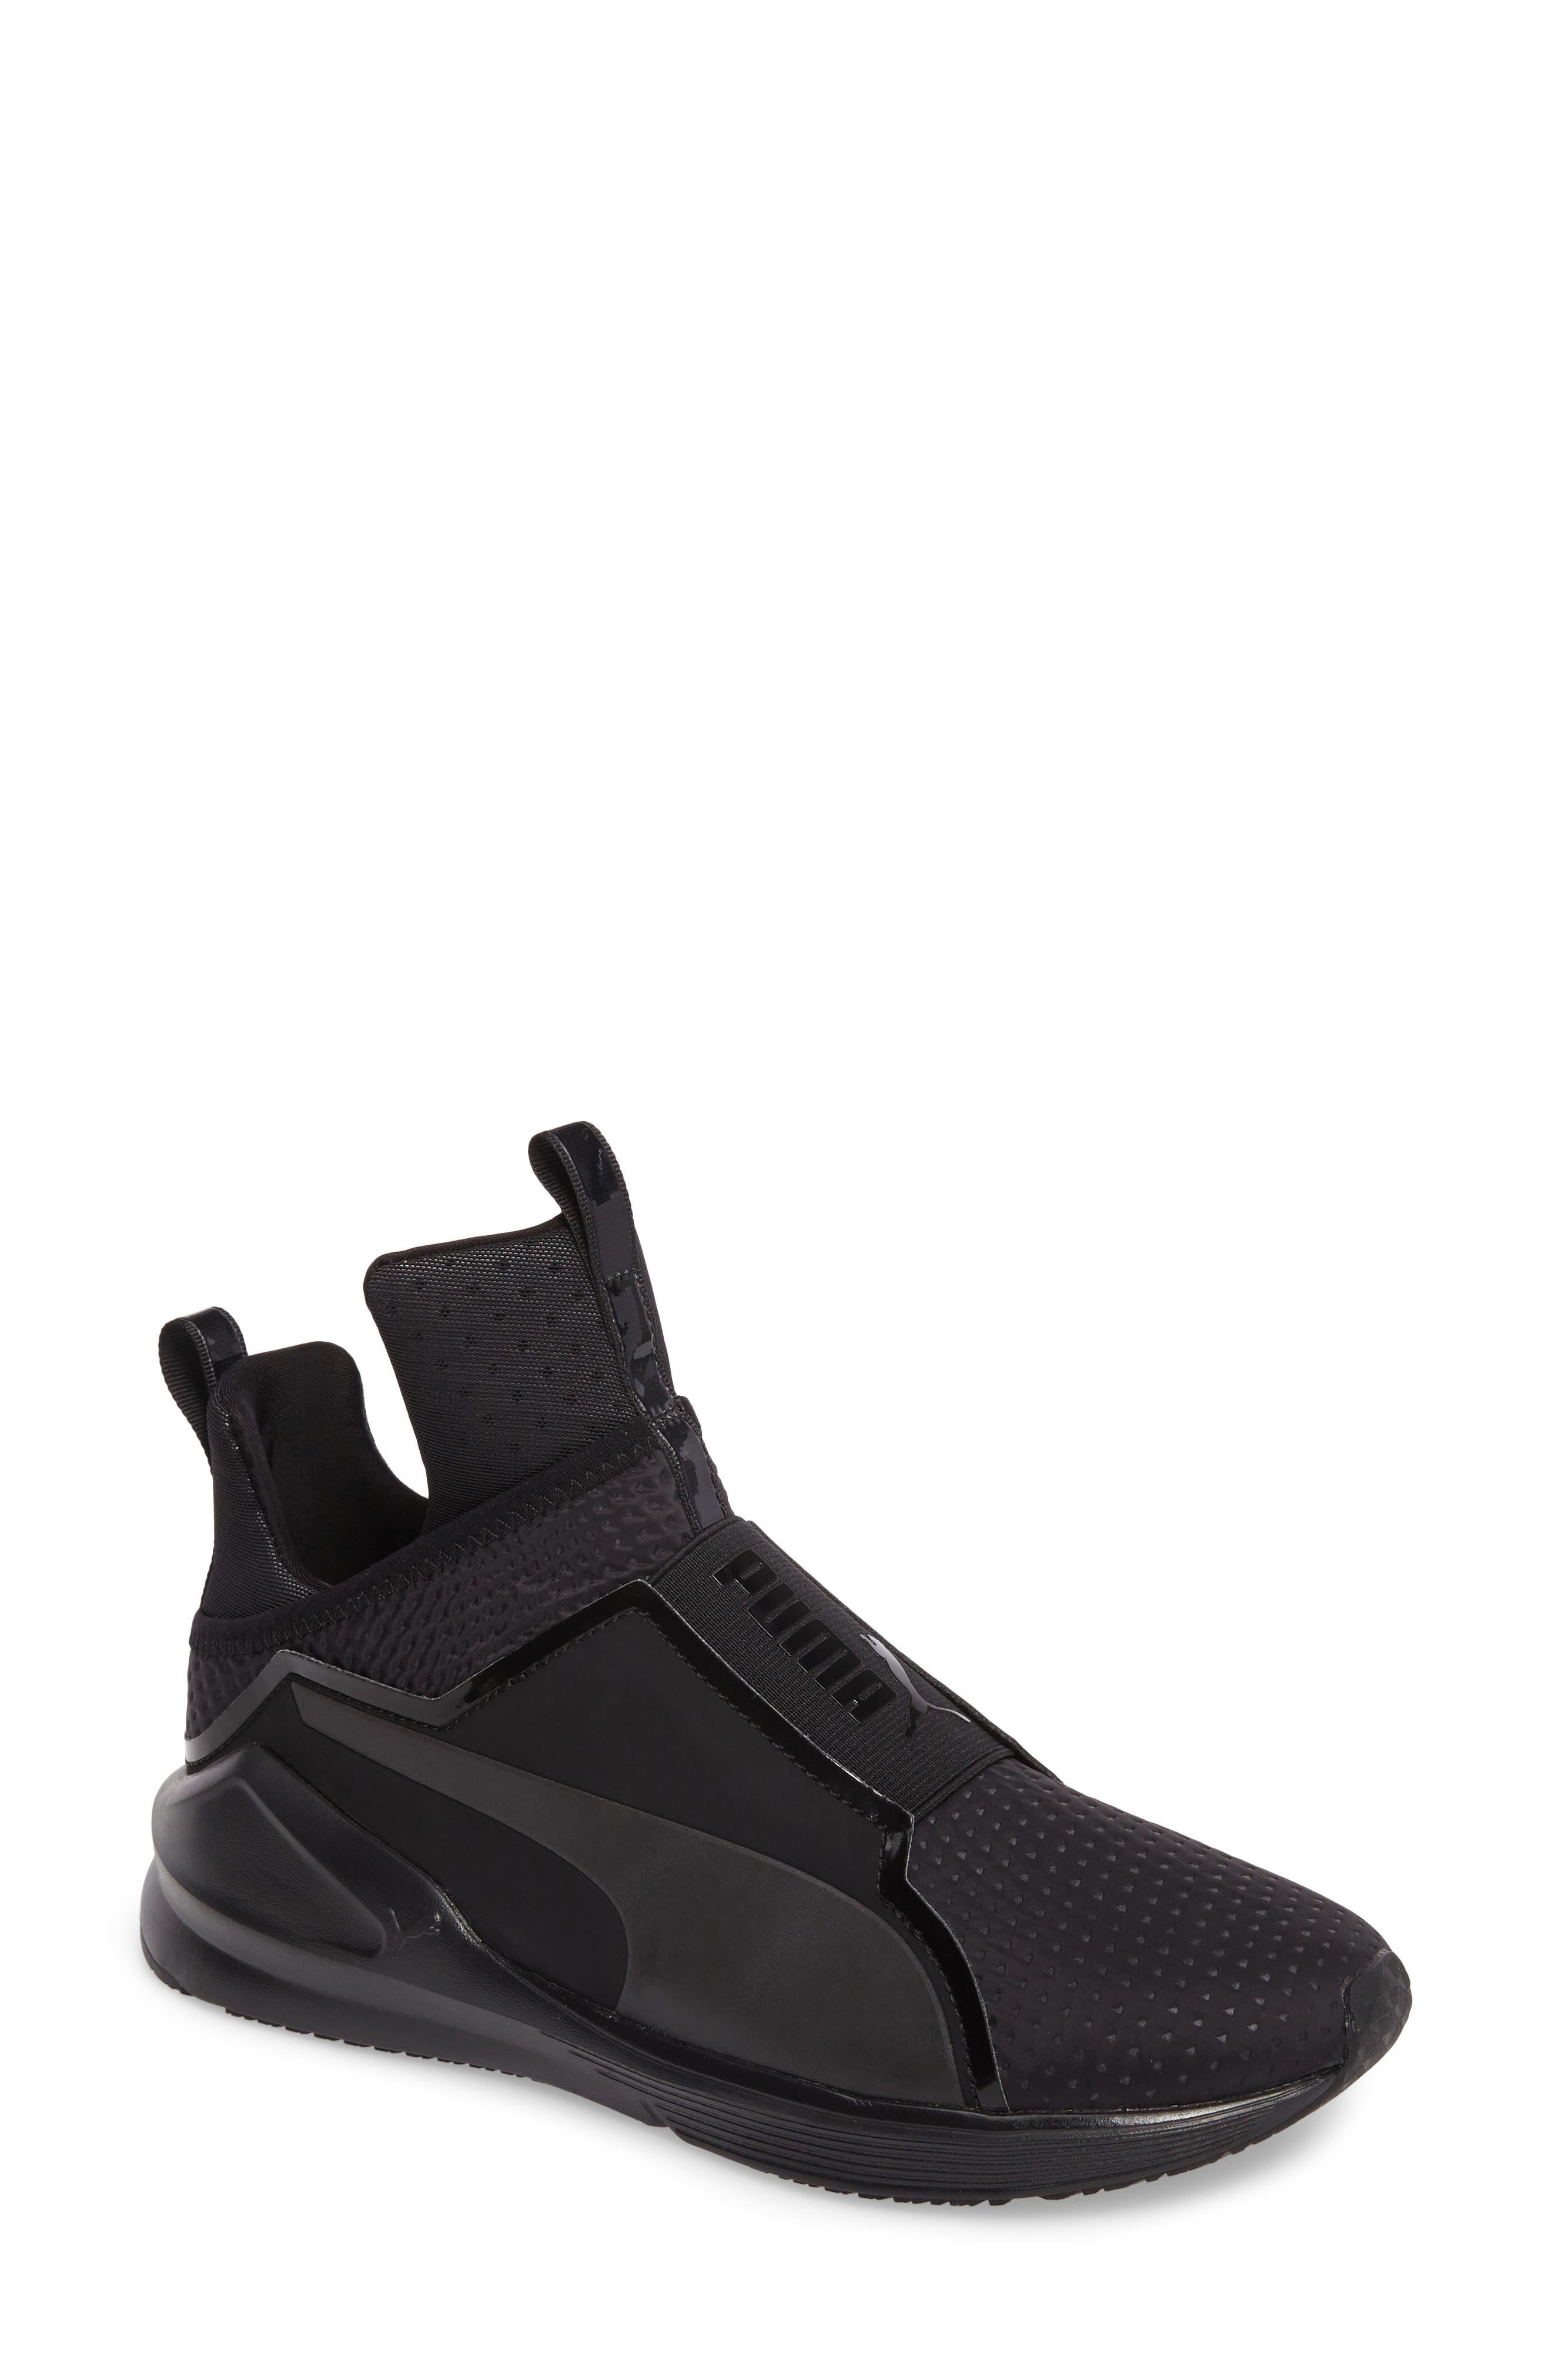 Alternate Image 1 Selected - PUMA 'Fierce Core' High Top Sneaker (Women)